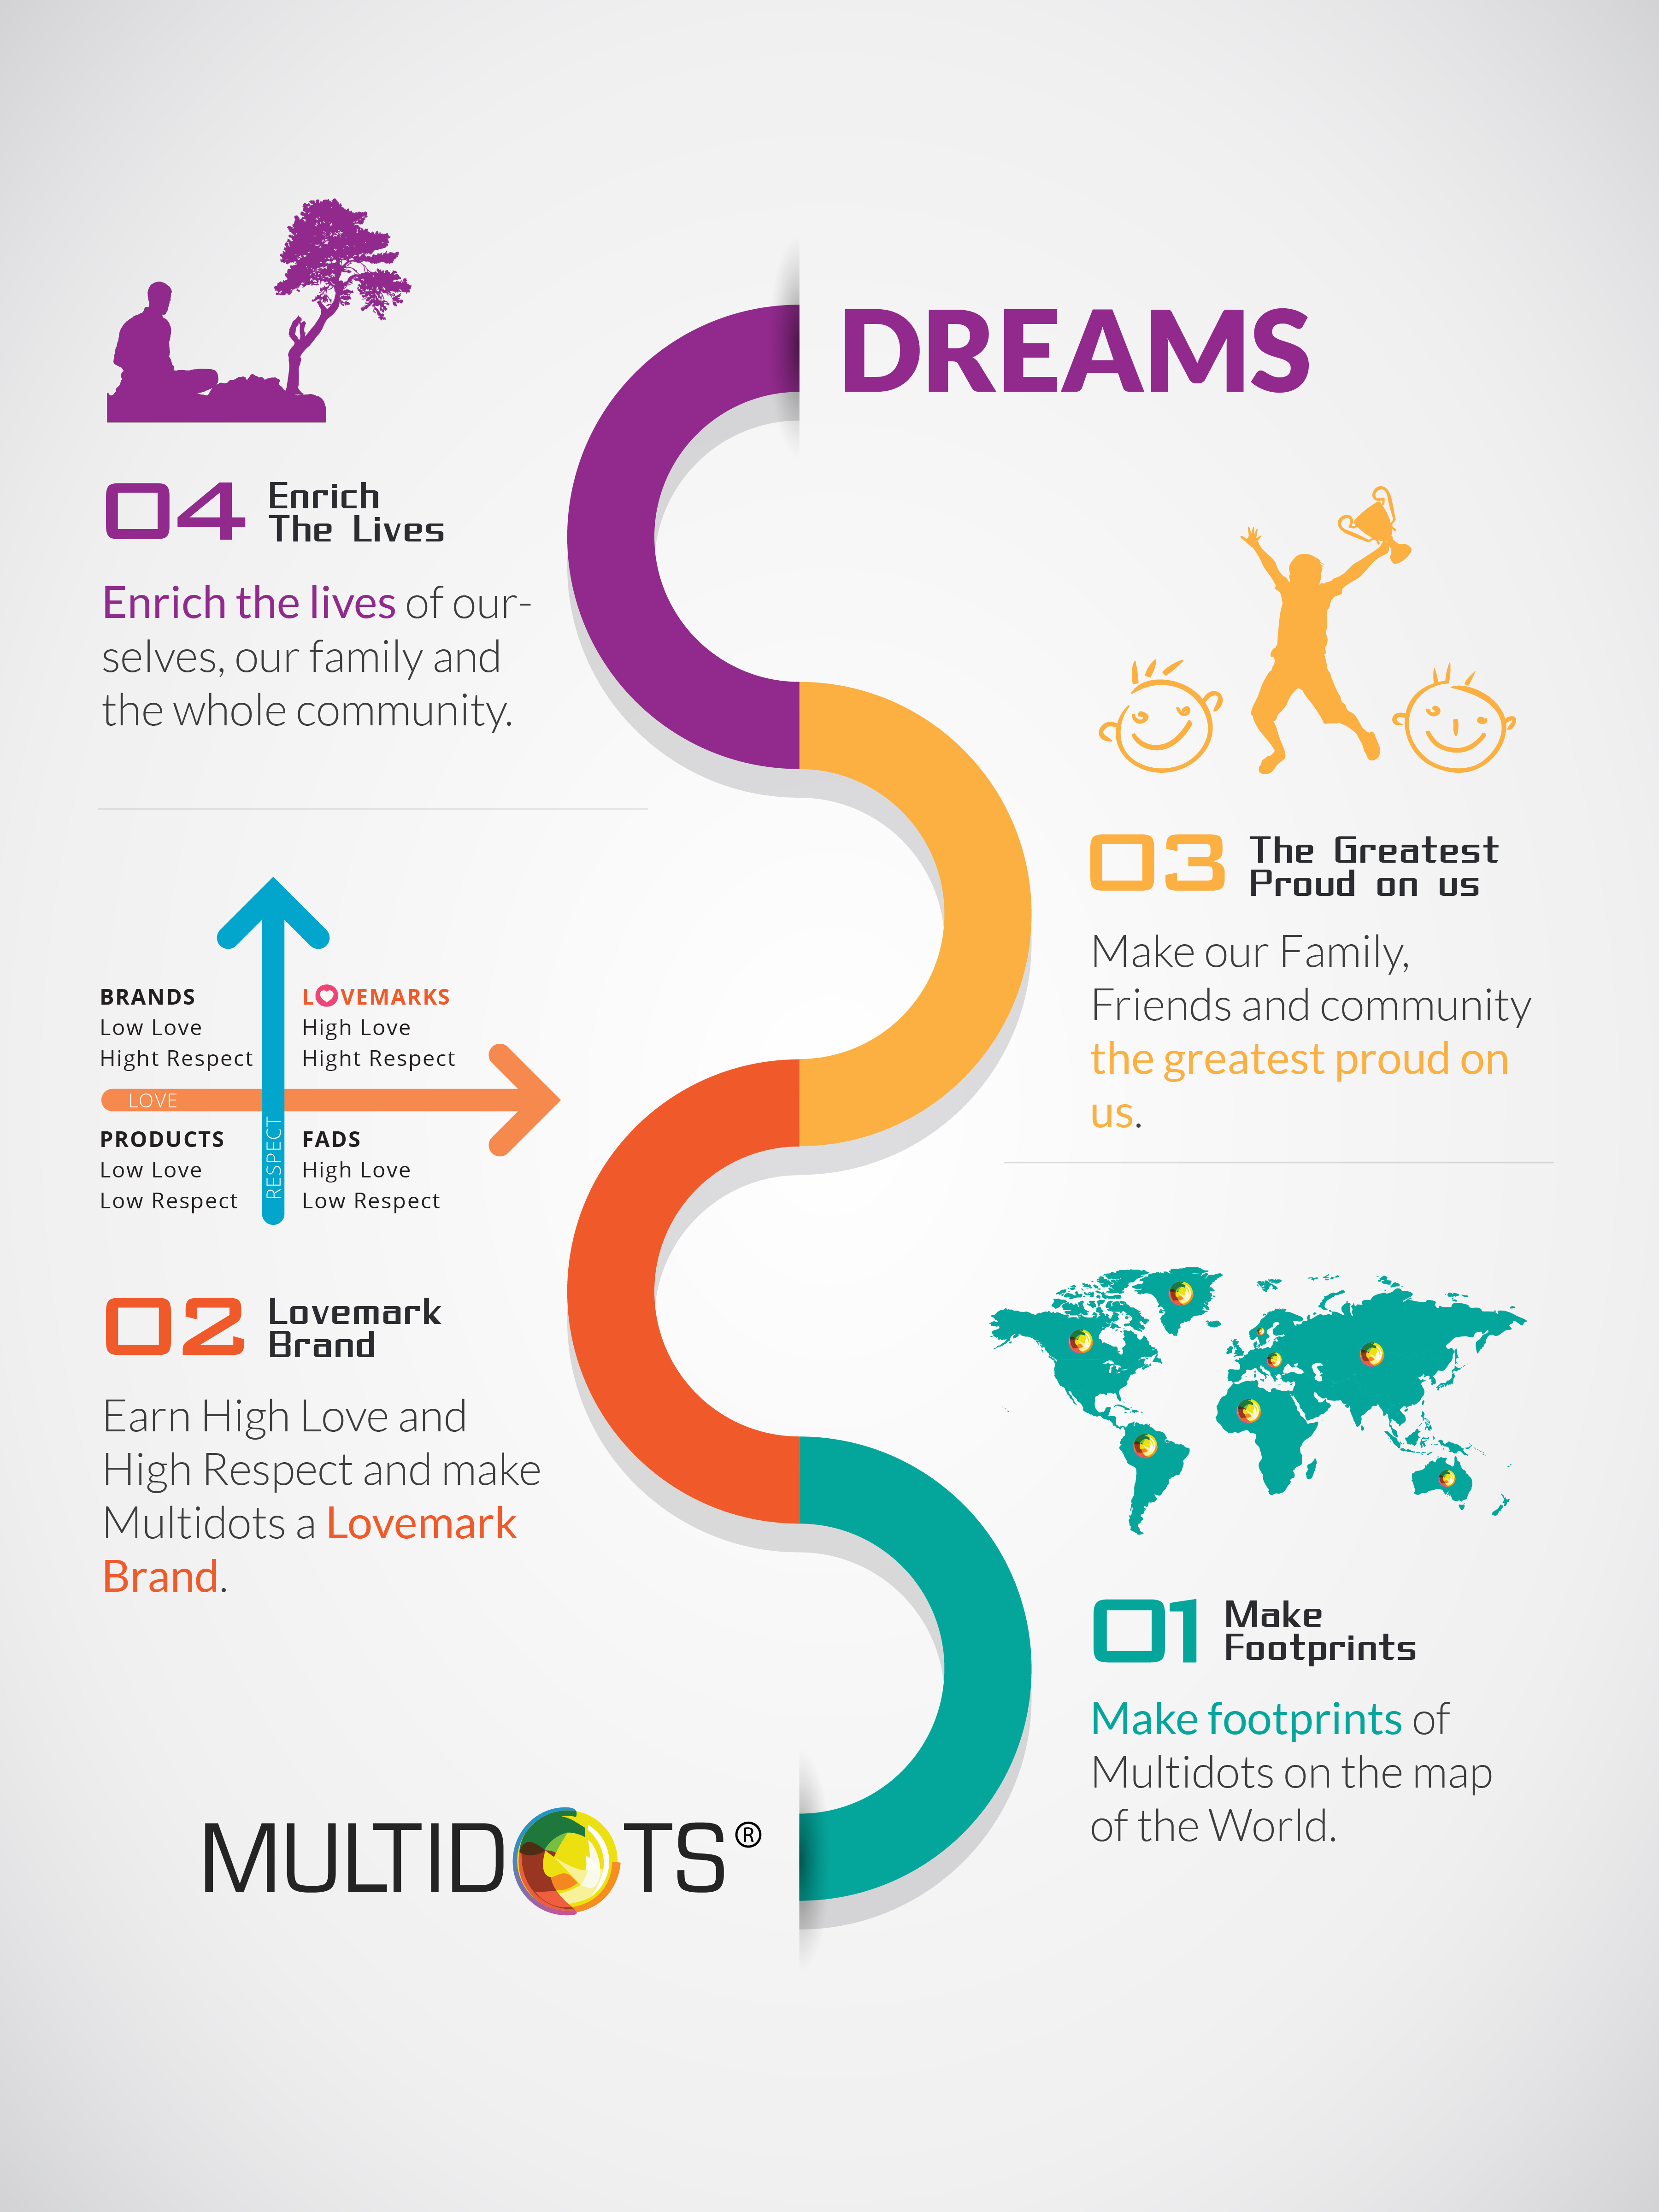 Multidots Dreams